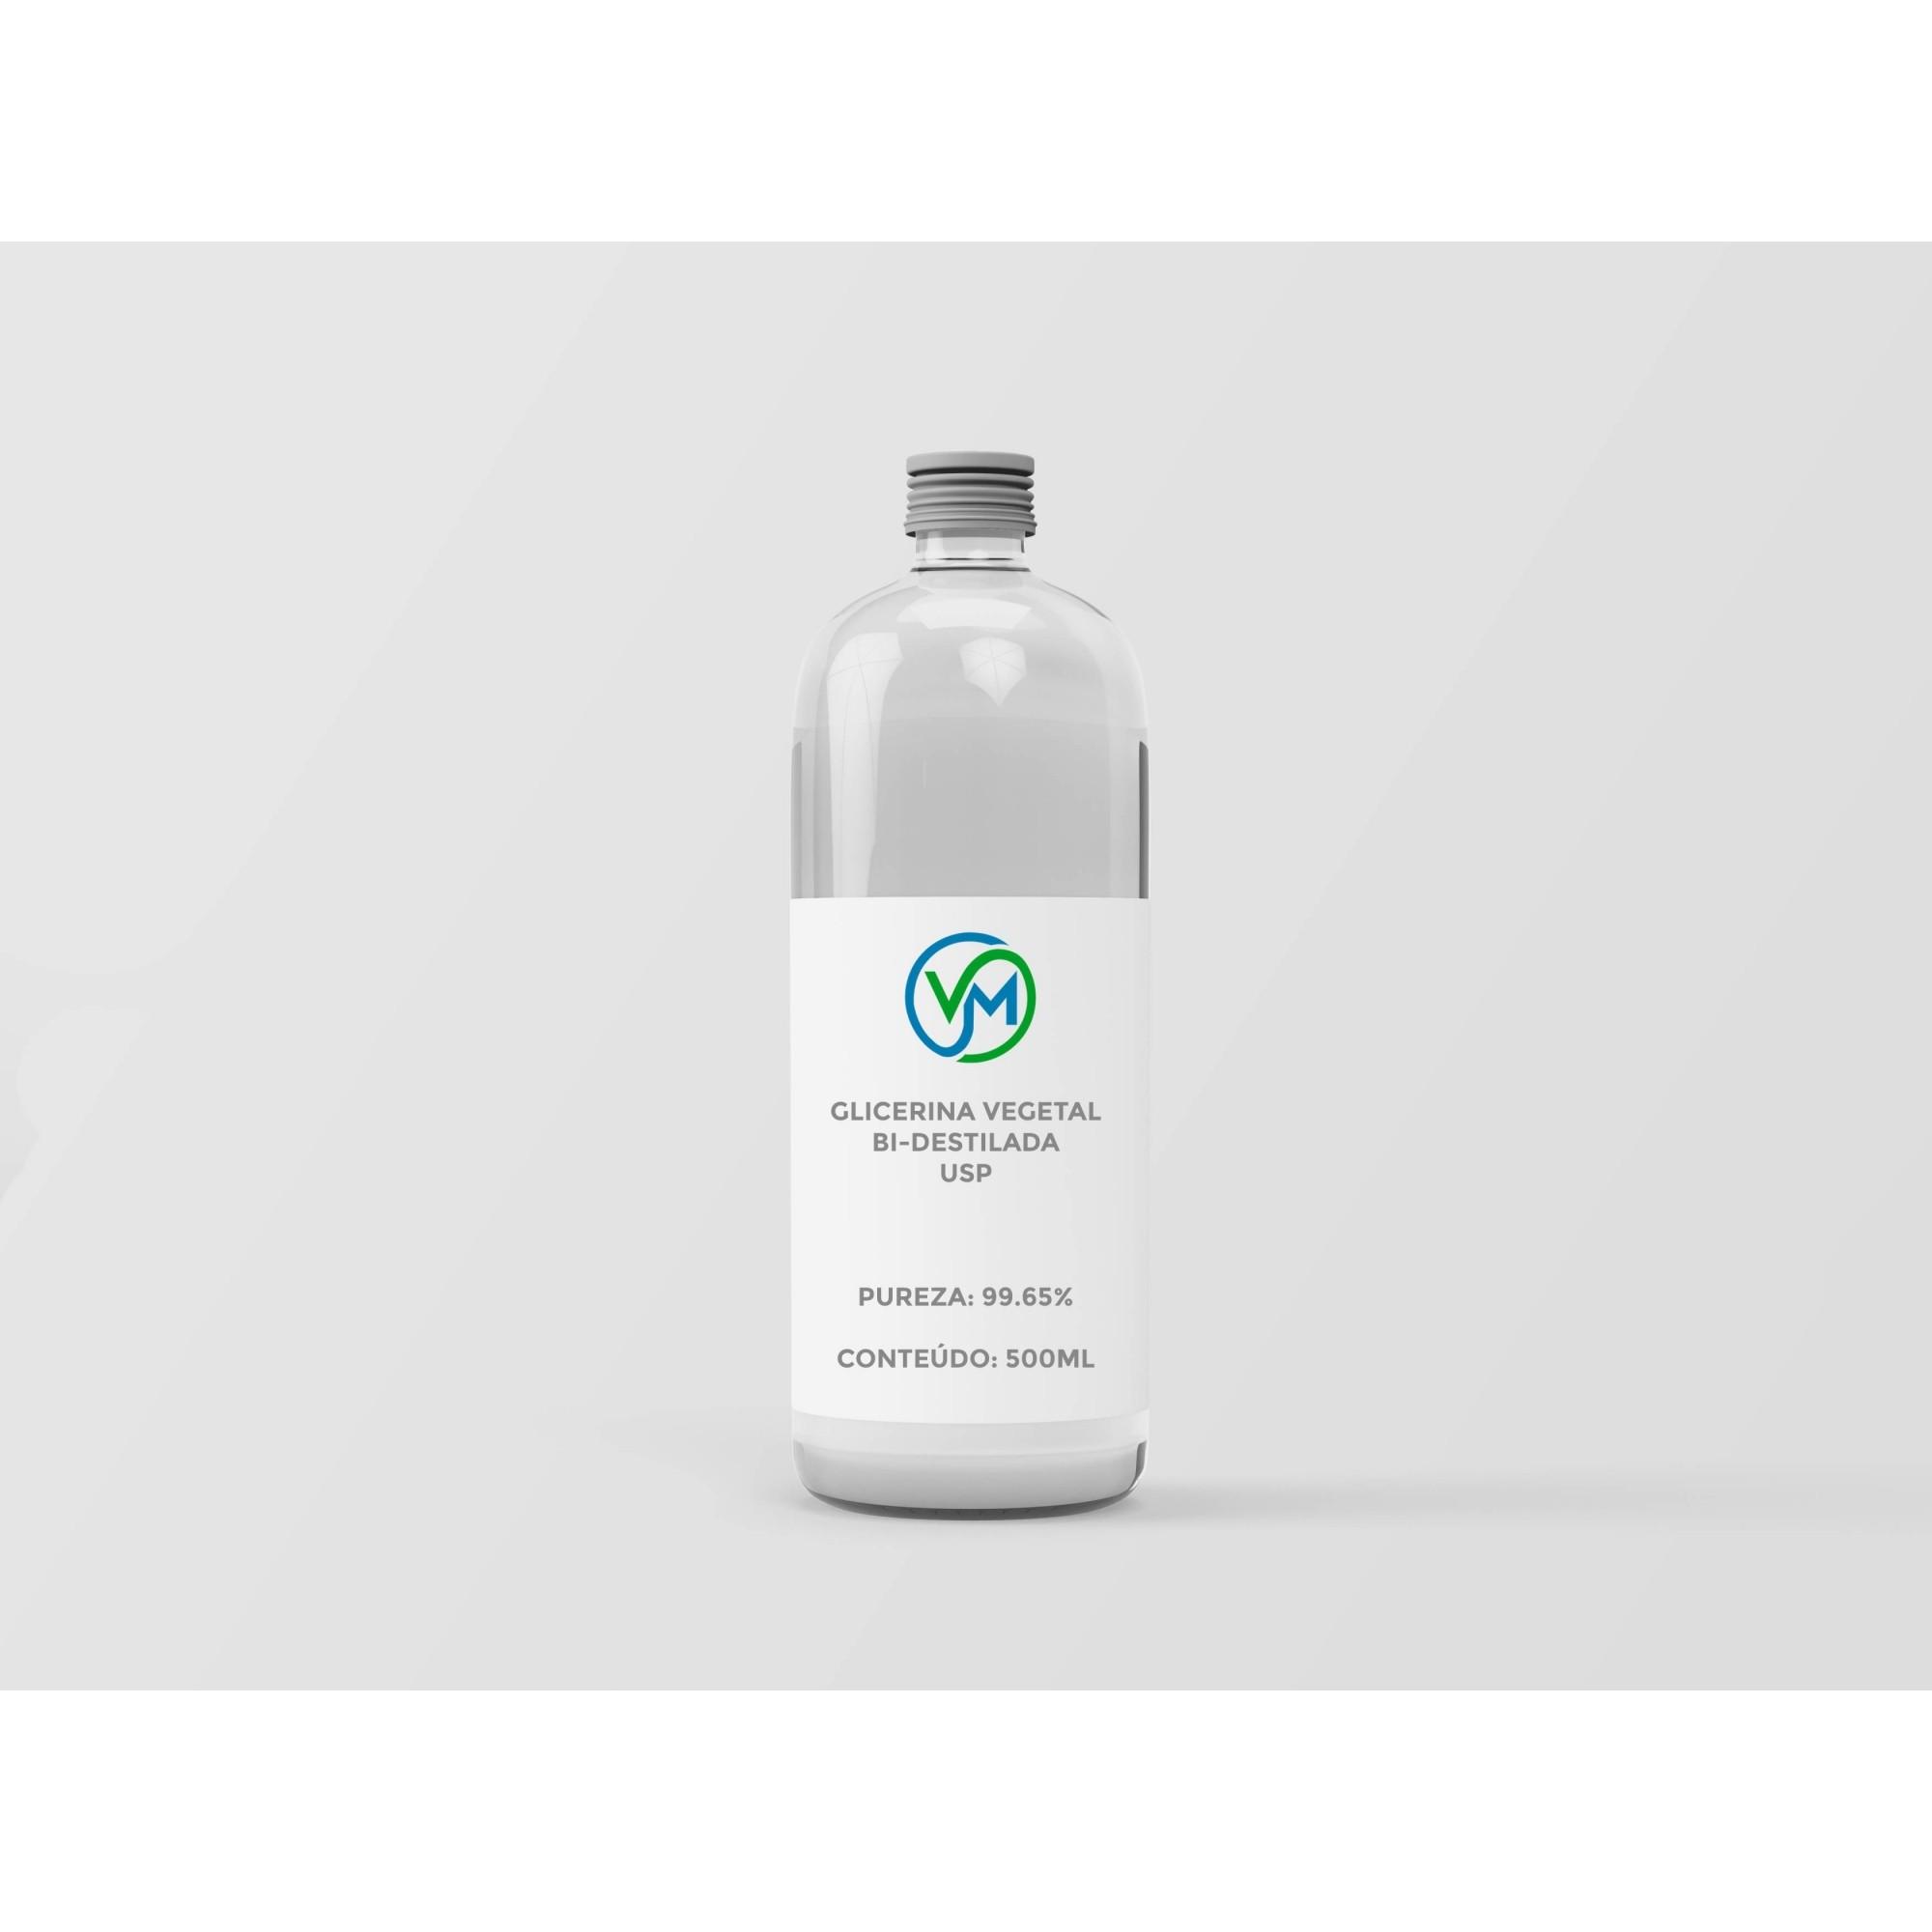 Glicerina Vegetal USP - 500ml